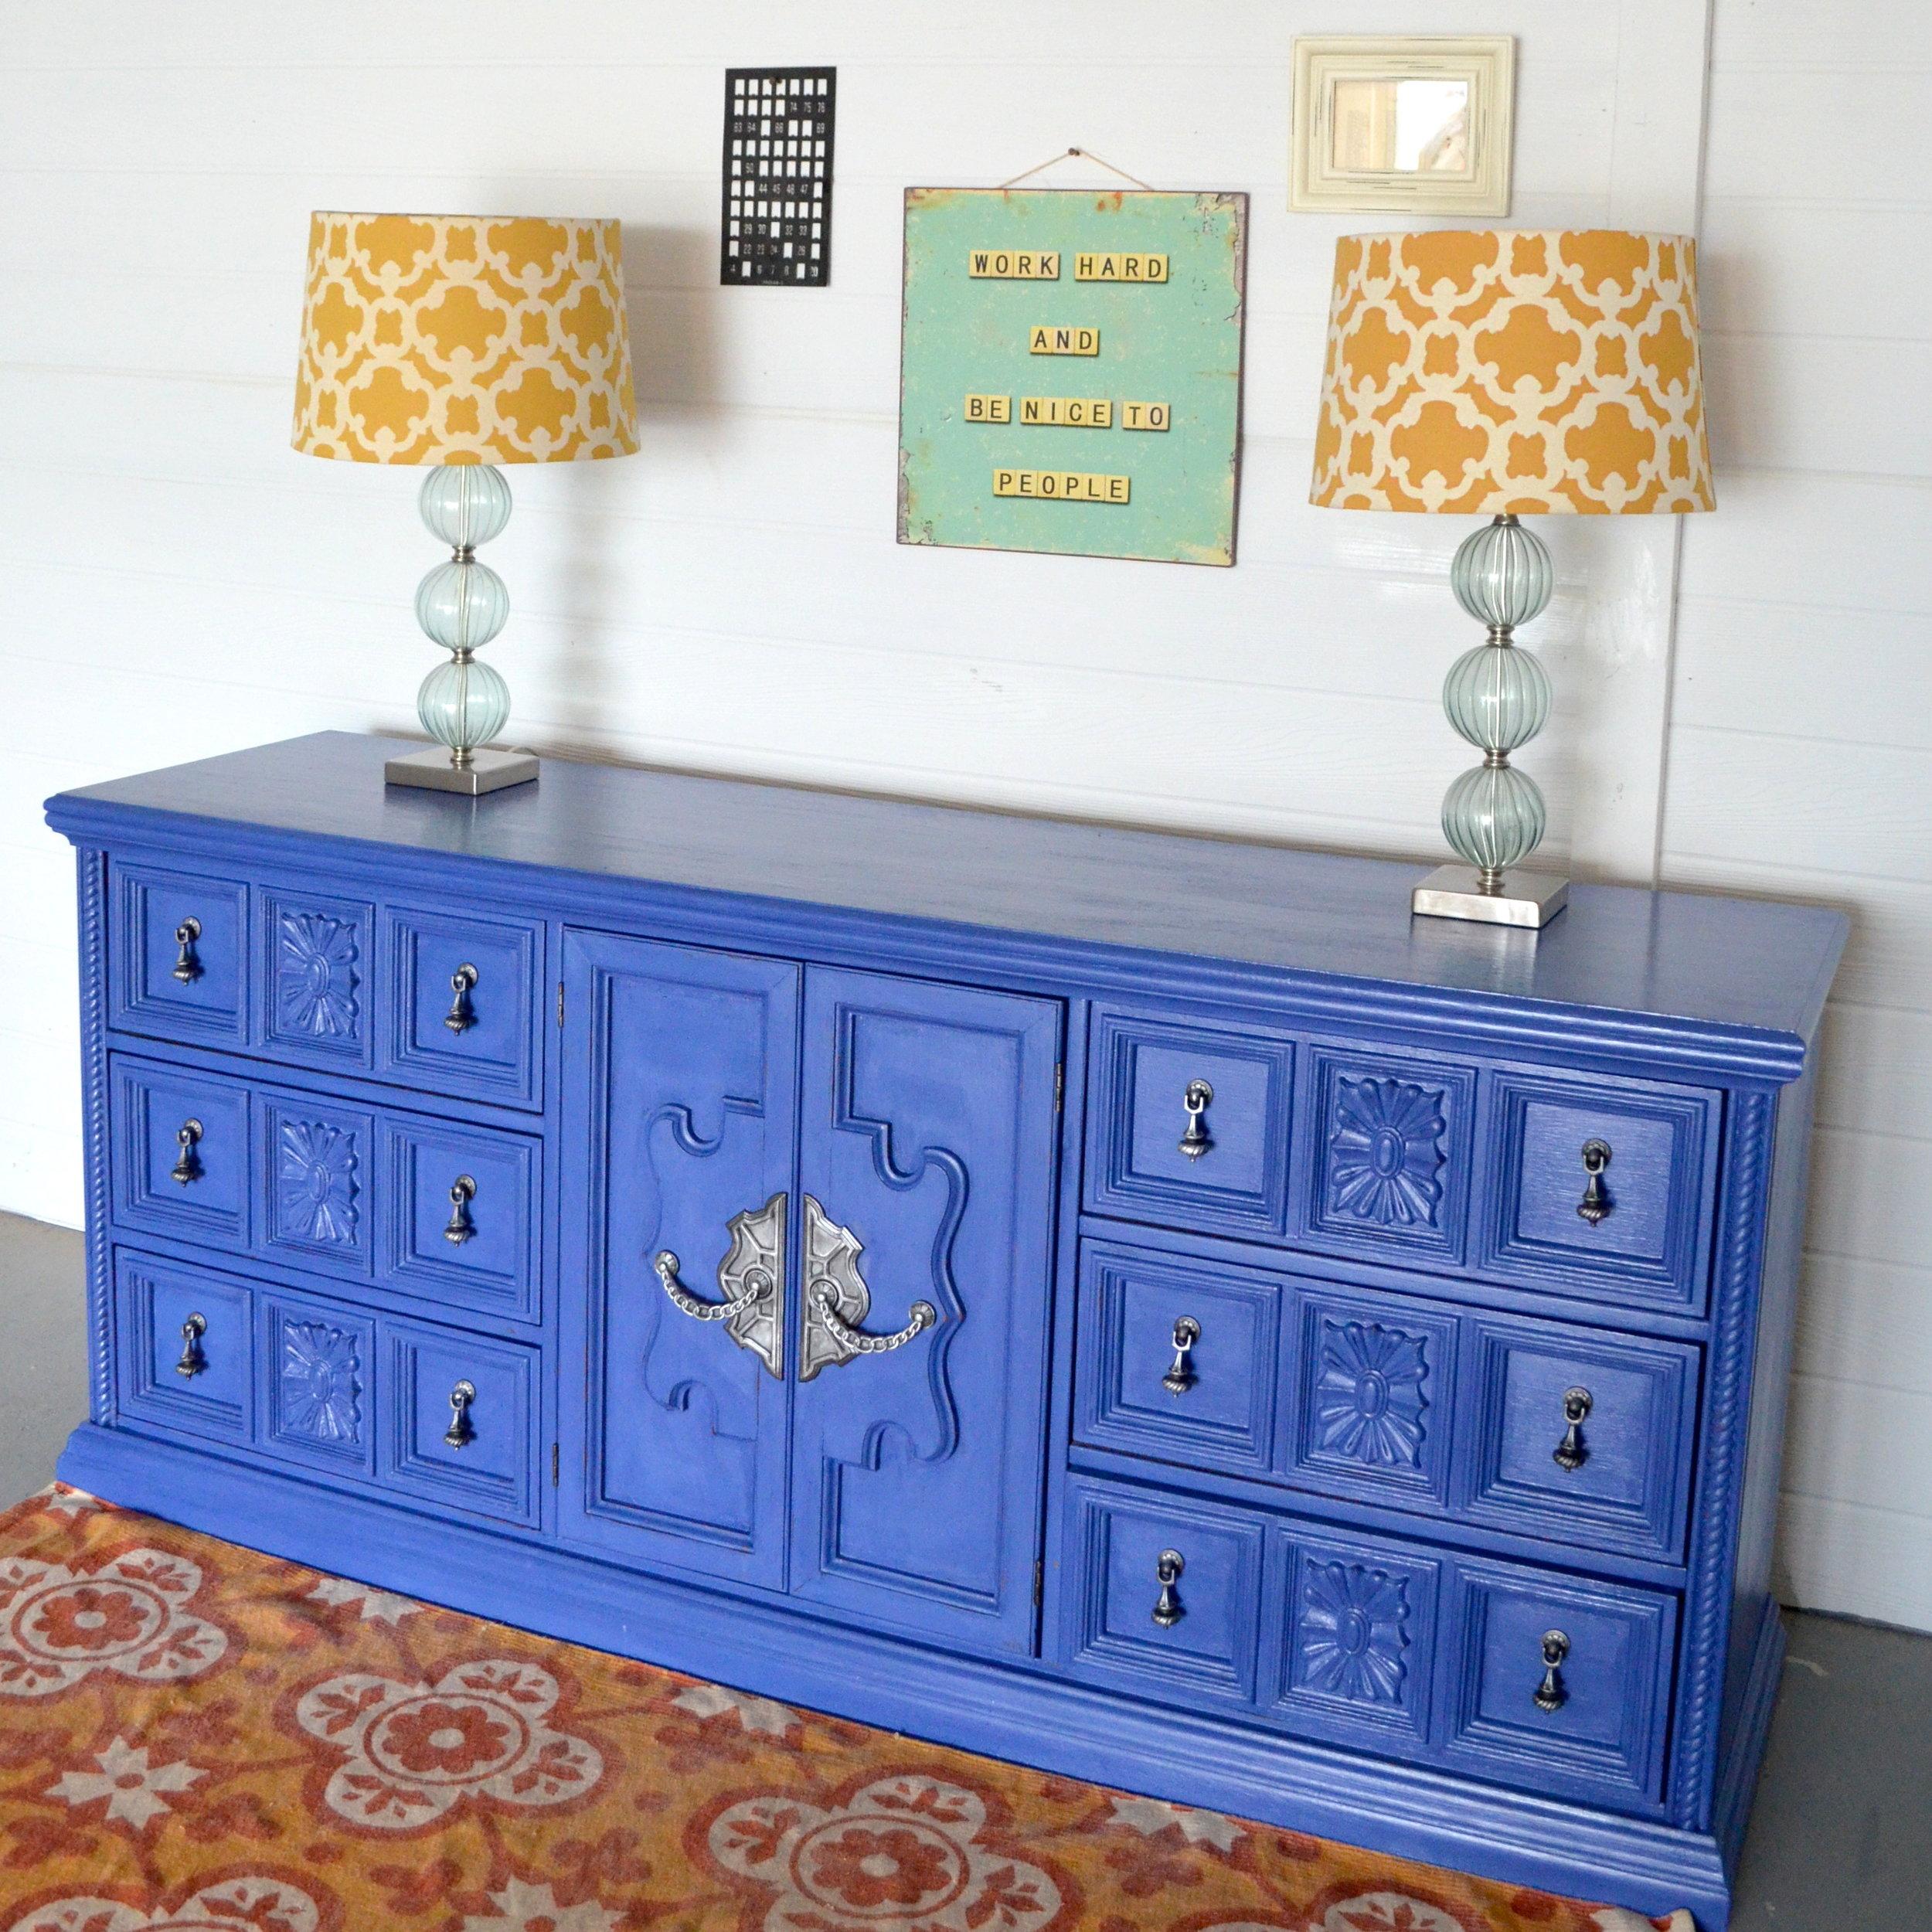 CeCe Caldwell Maine Harbor Blue Dresser 2